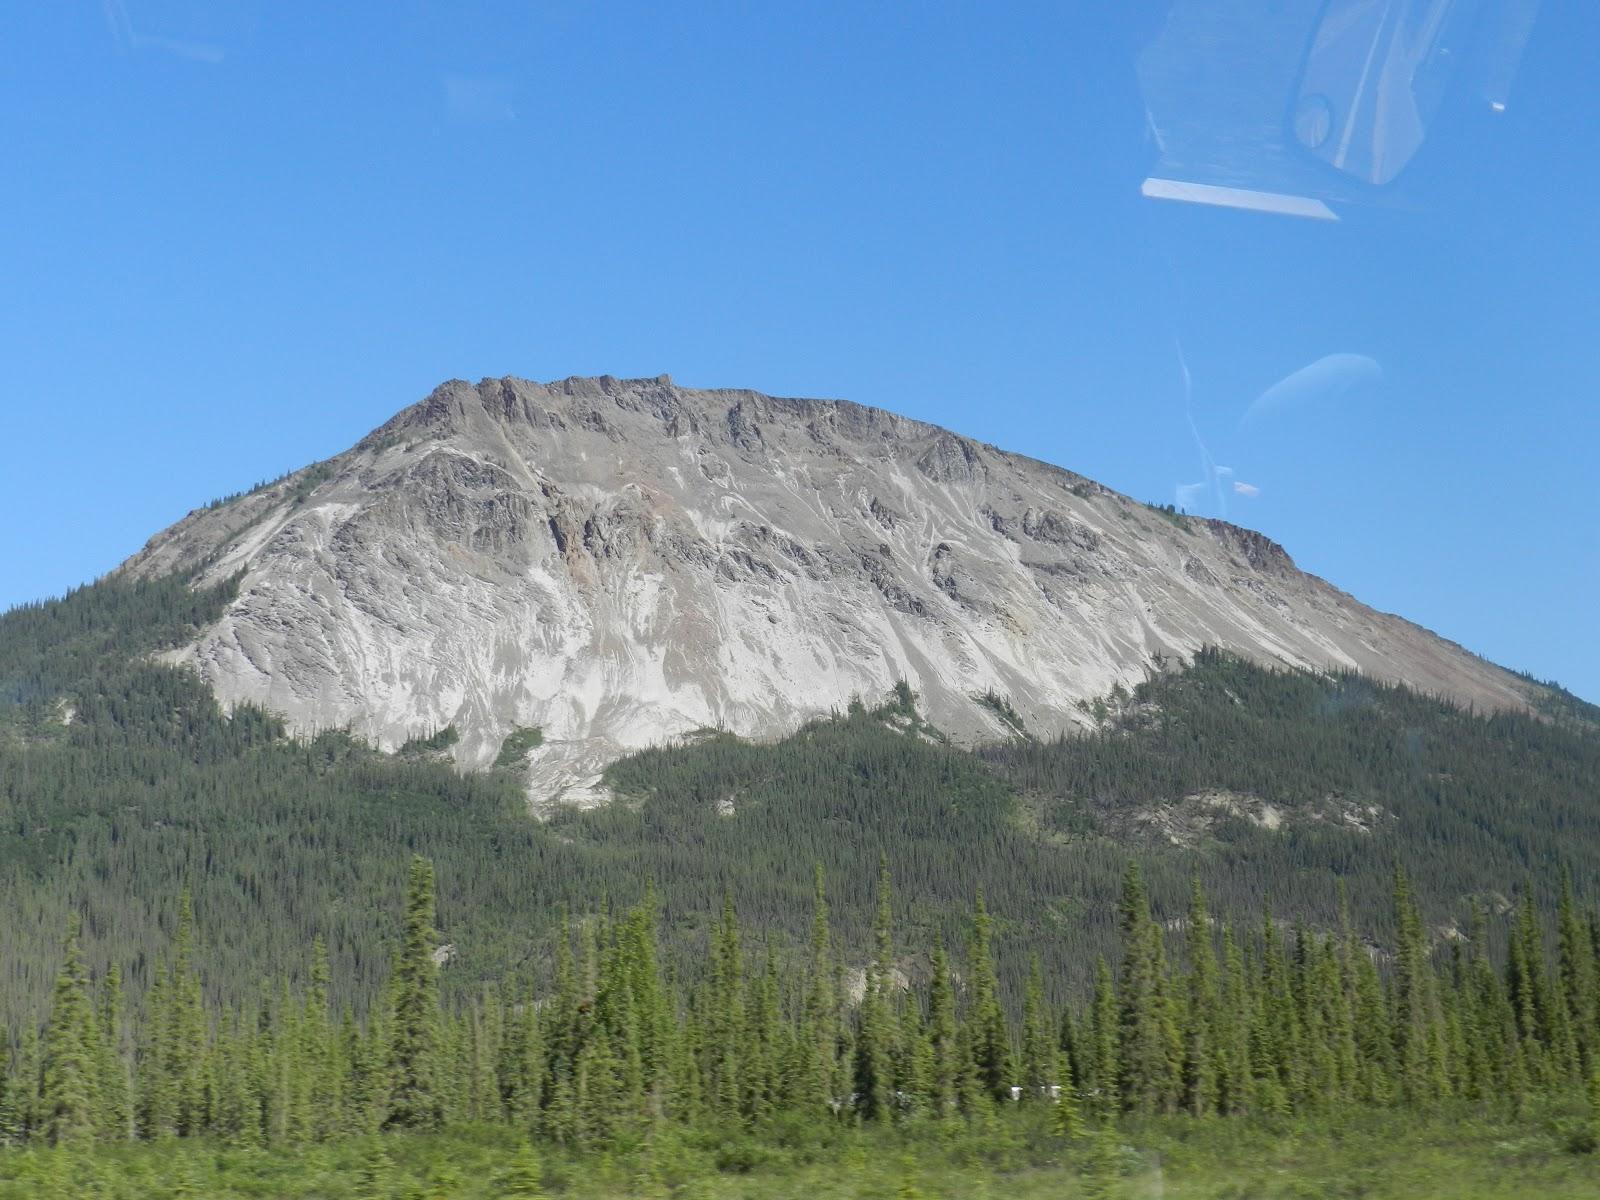 Anita S Adventures 2012 June 19 On To Deadhorse Alaska